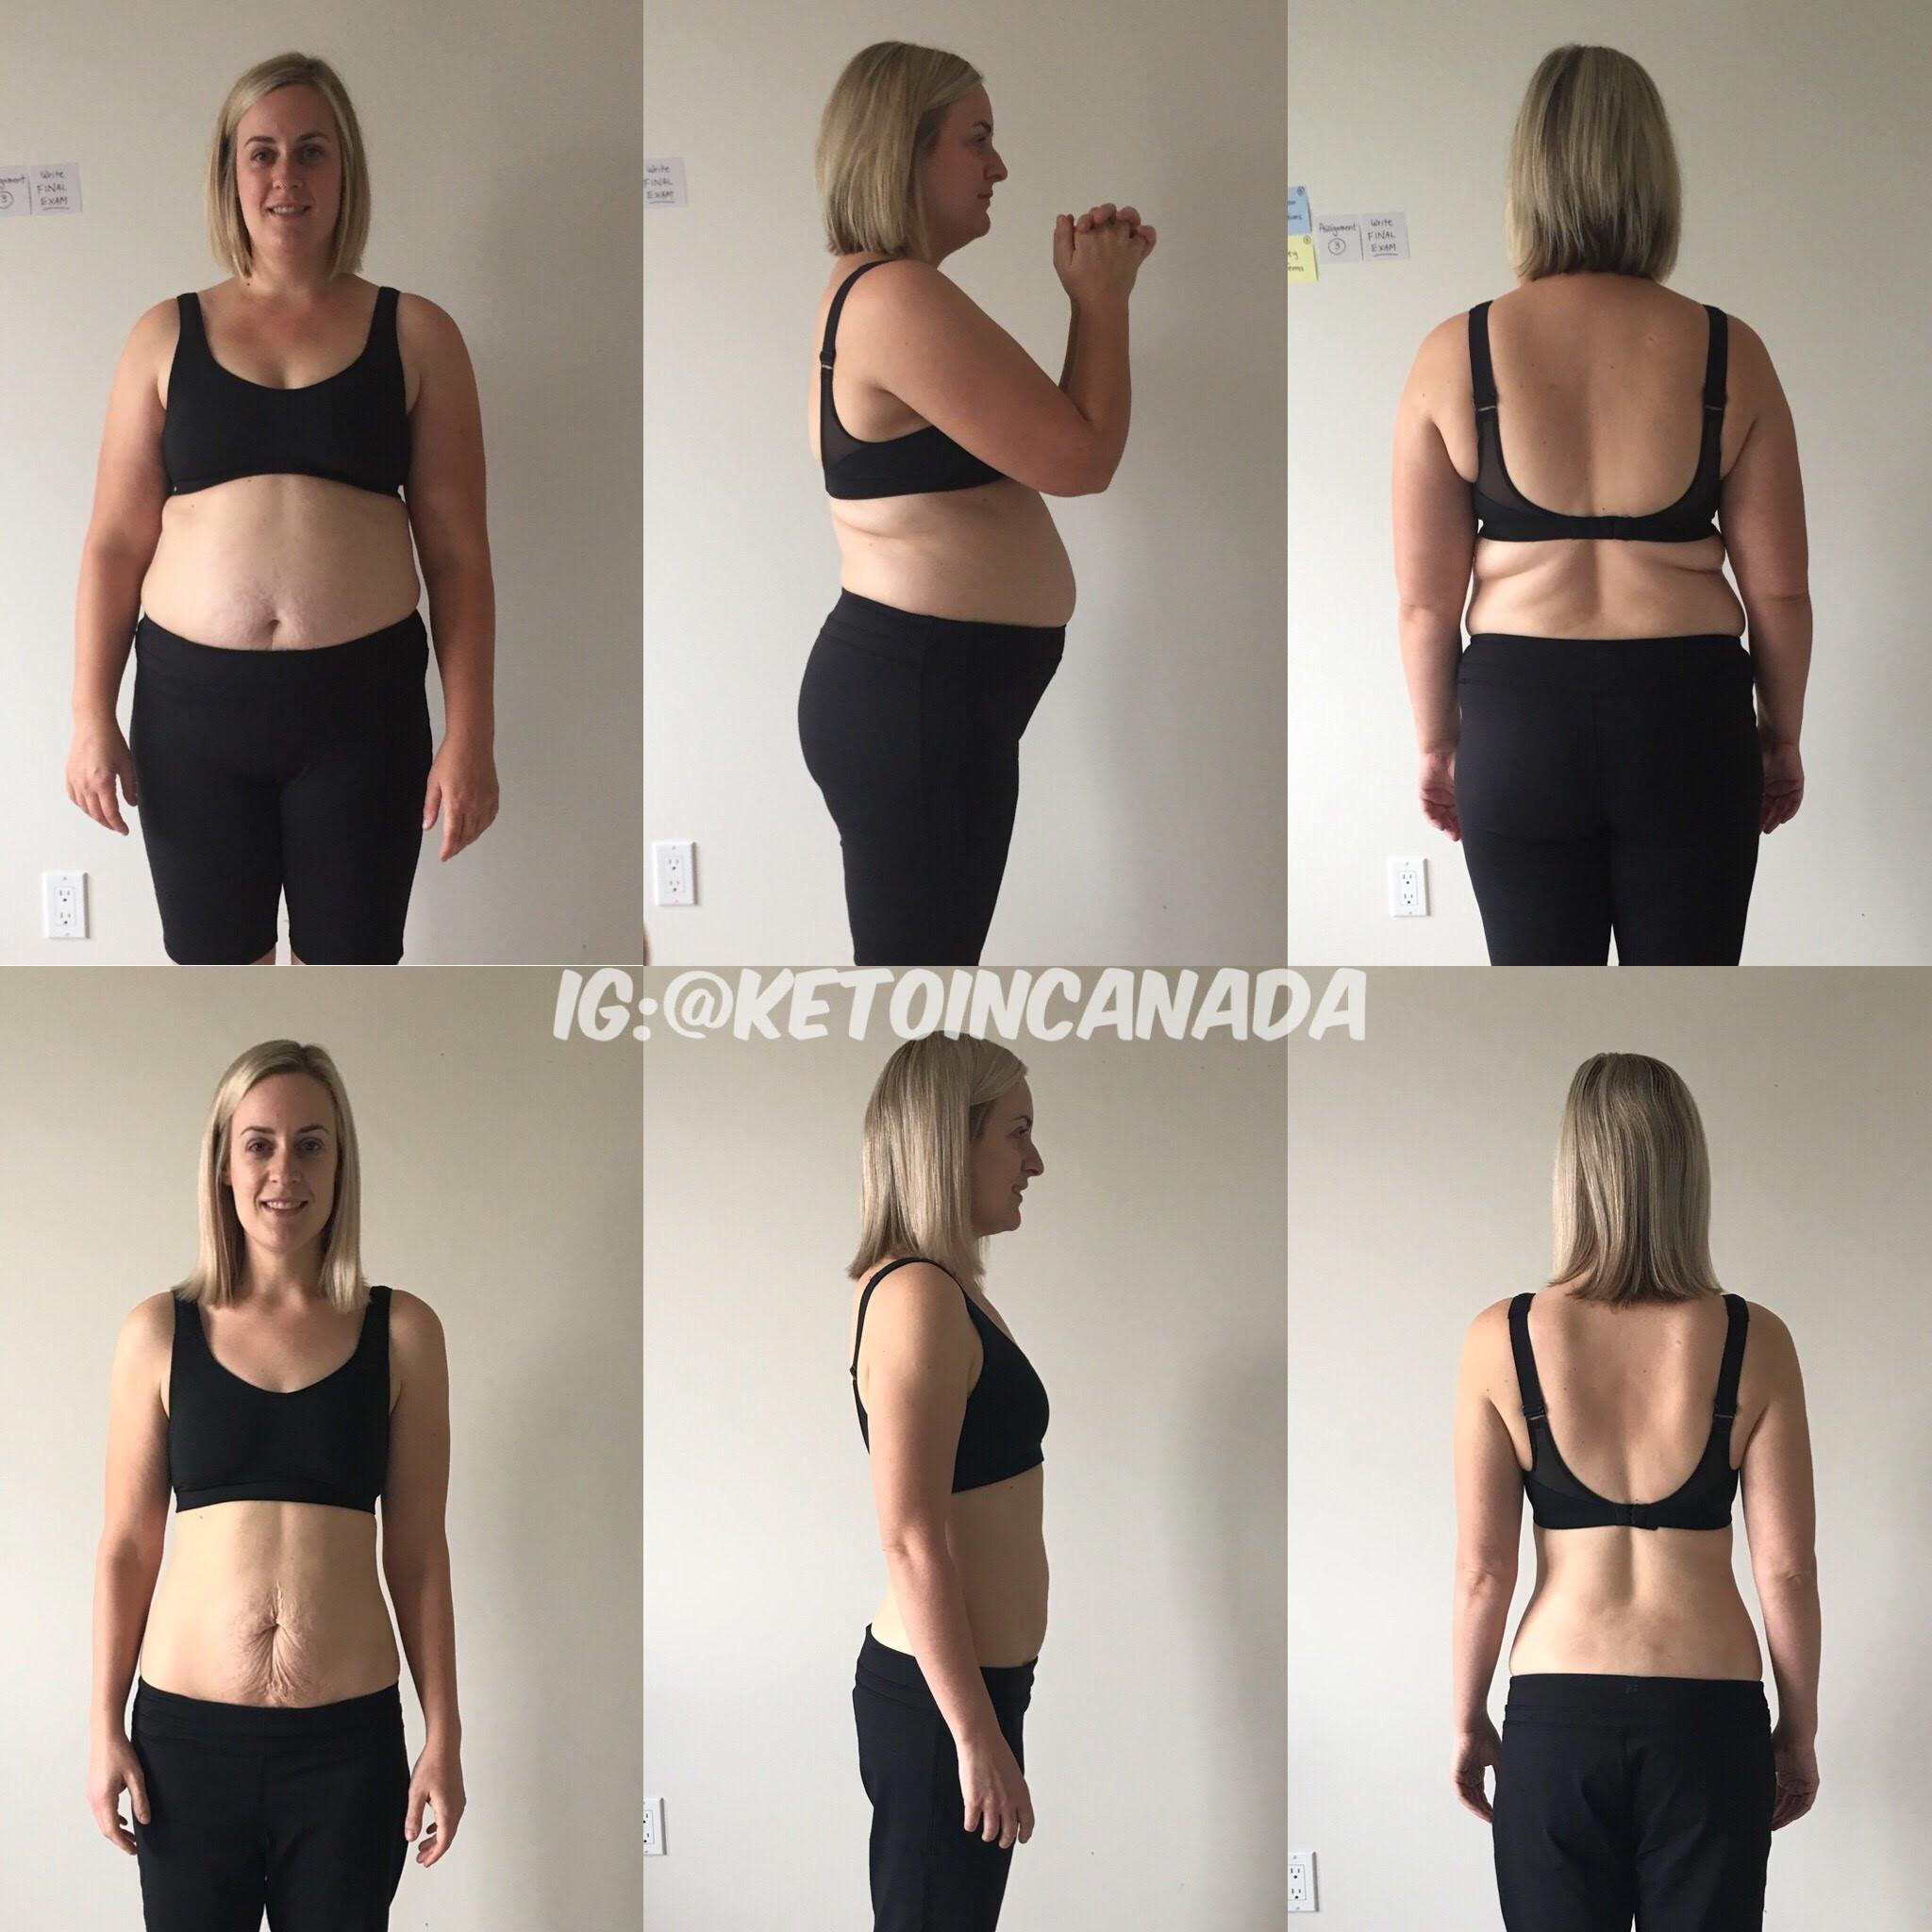 Losing Weight On Keto Diet  Keto Diet Success KetoinCanada Canadian Mom s her